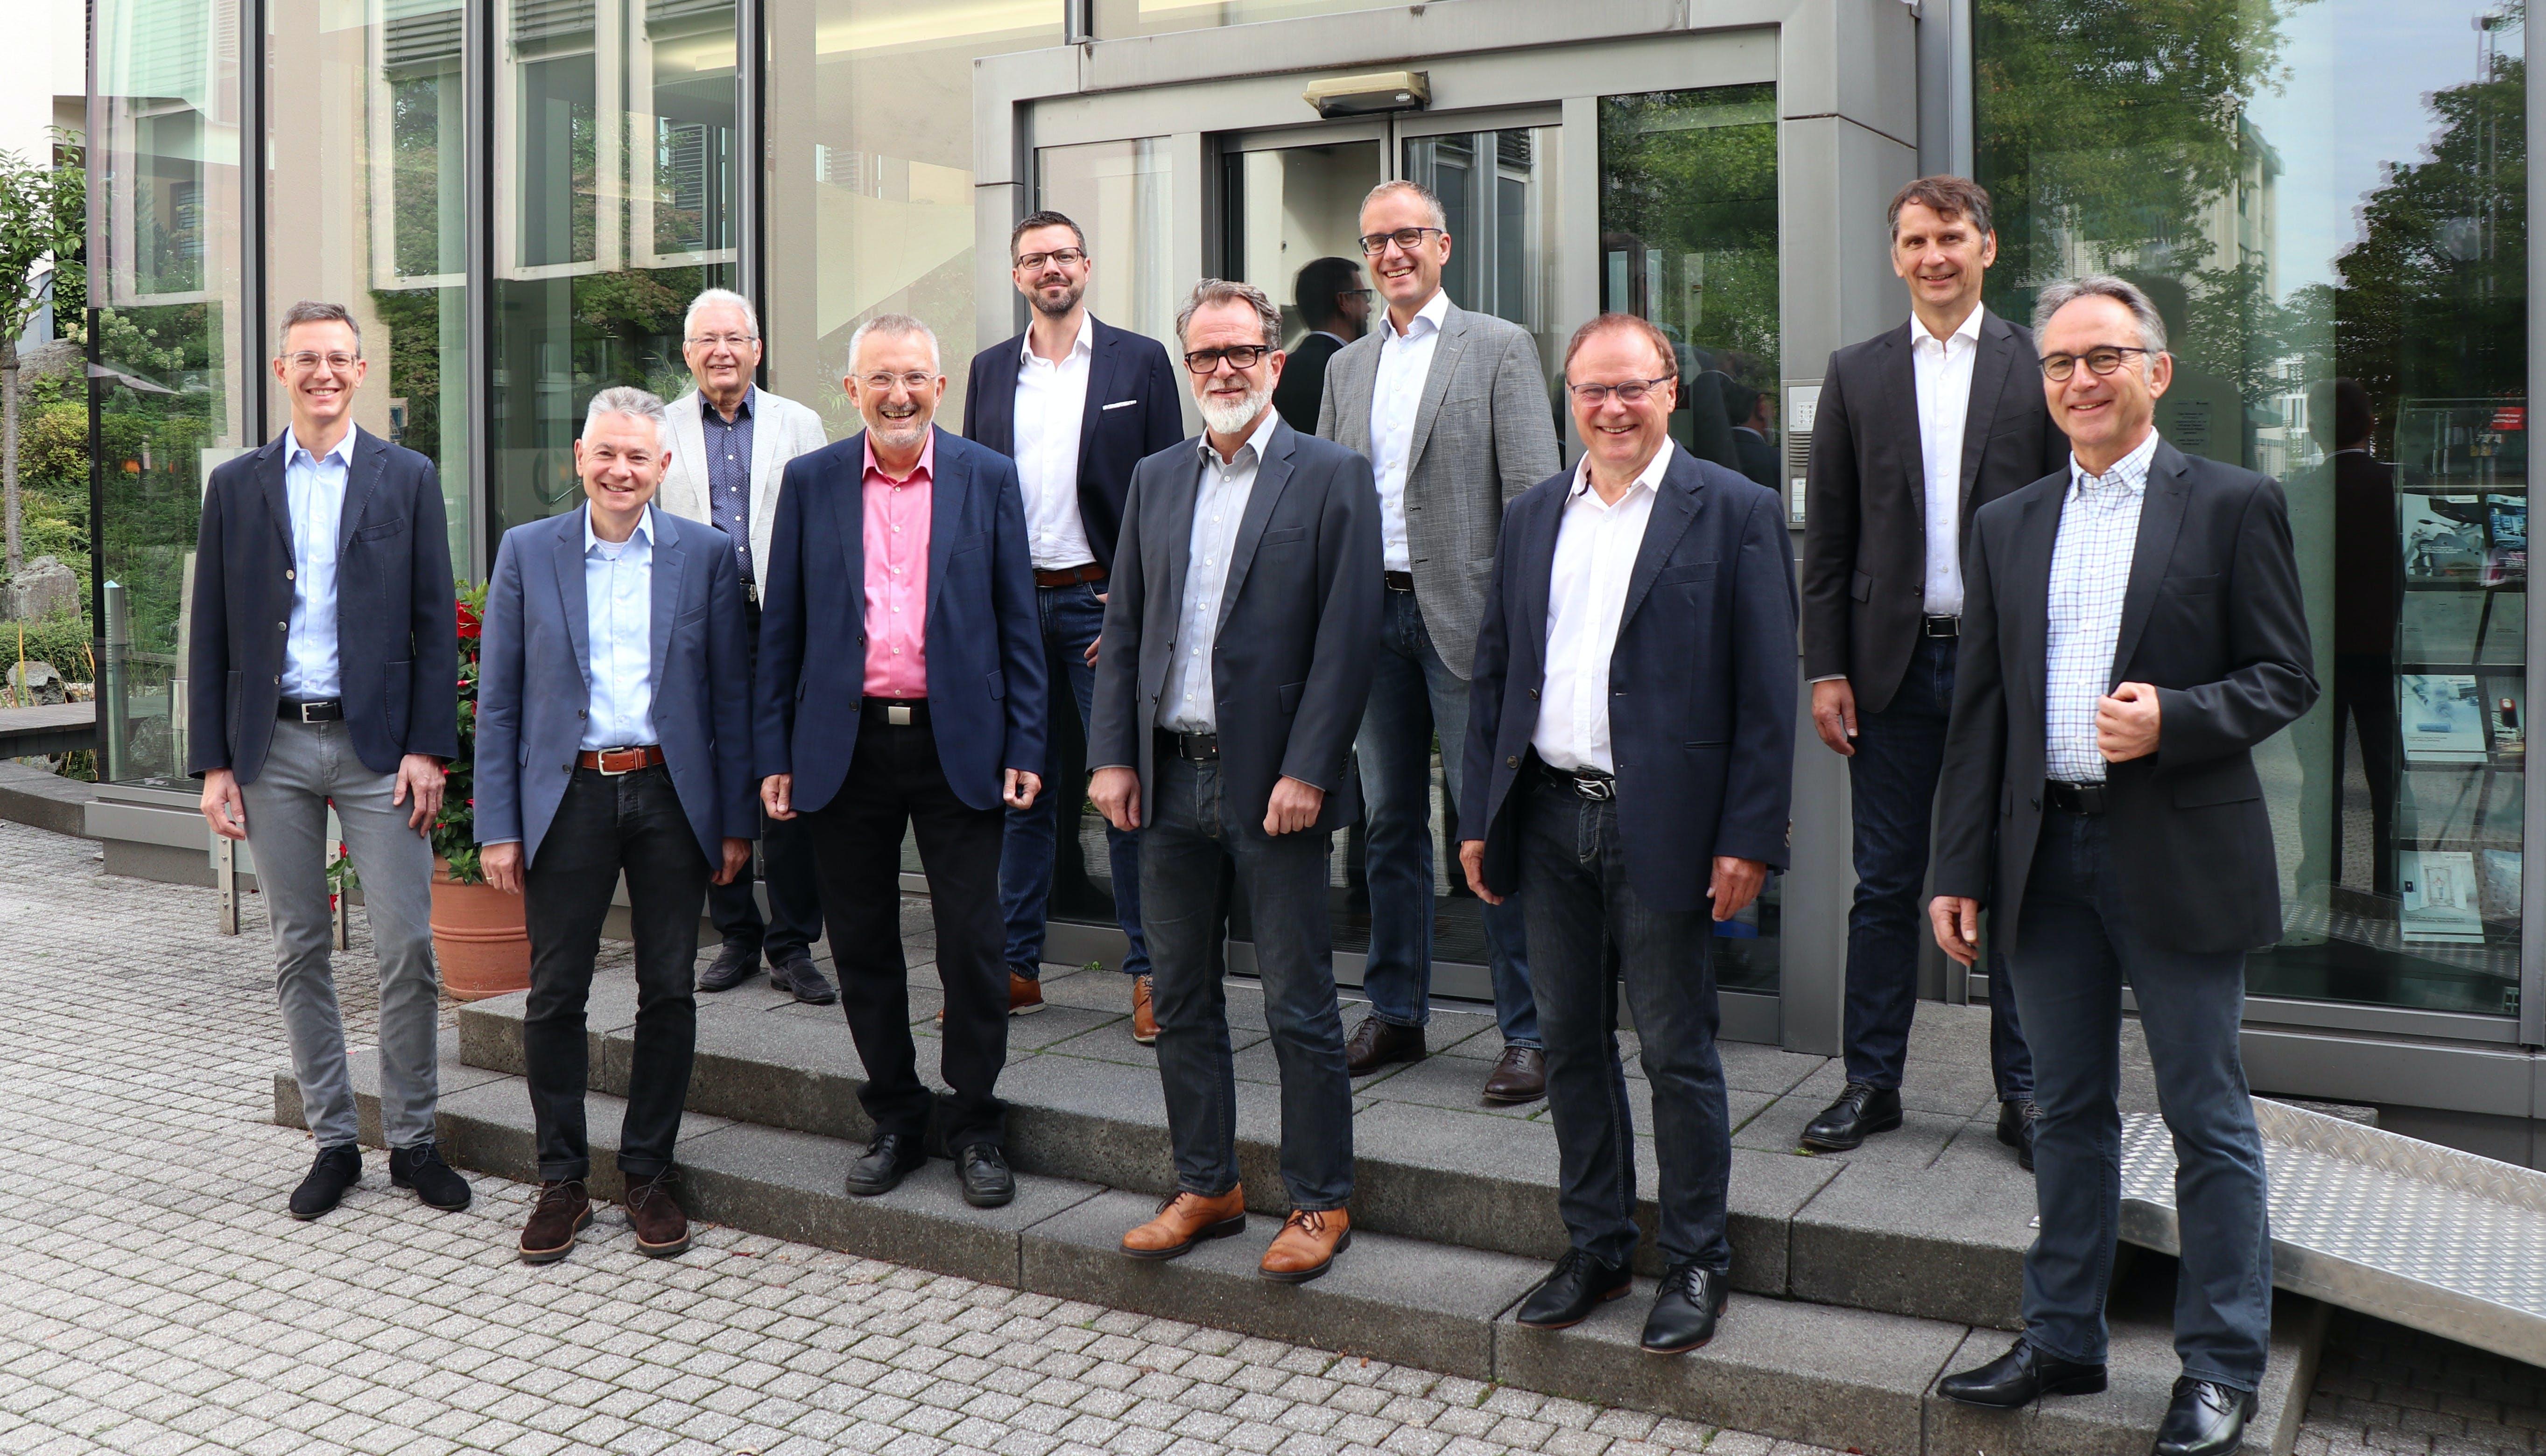 N. Stein, T. Posert, B. Wagner, M. Maurer, D. Scholz-Stein, T. Preusser, R. Koy-Oberthür, M. Pörner, G. Bär, H. Frohn